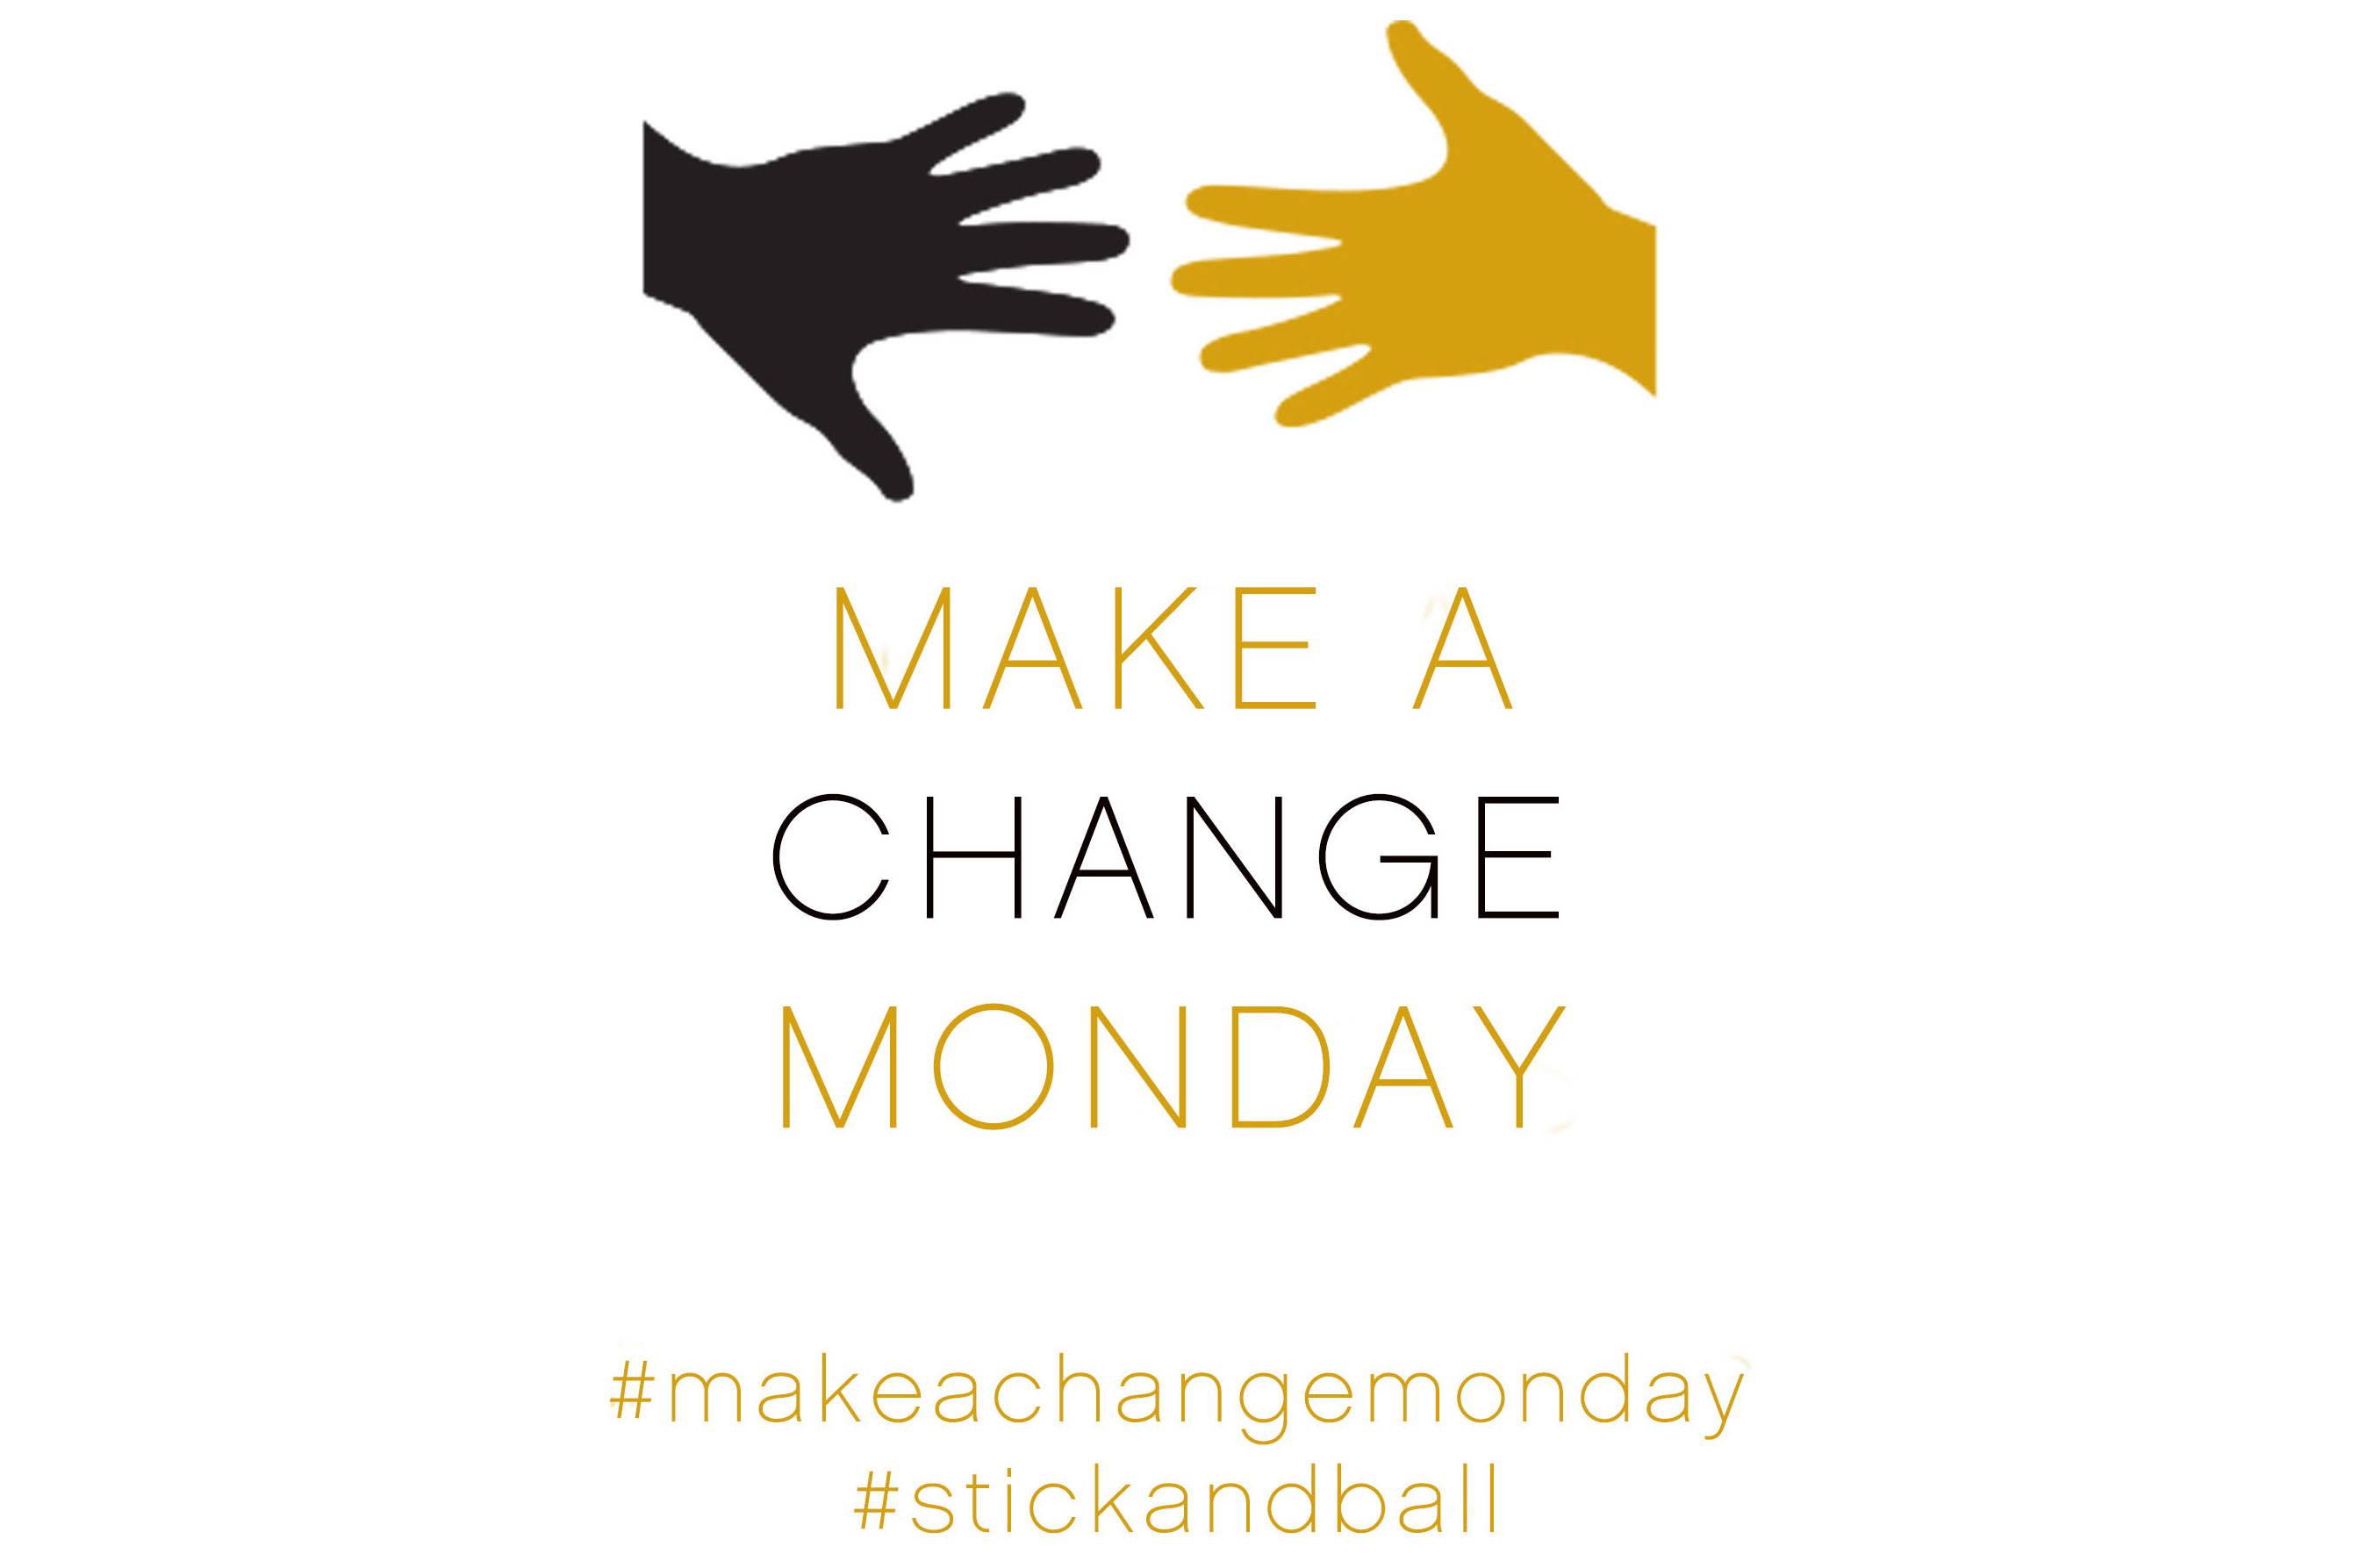 Logo for Make A Change Monday initiative by Stick & Ball